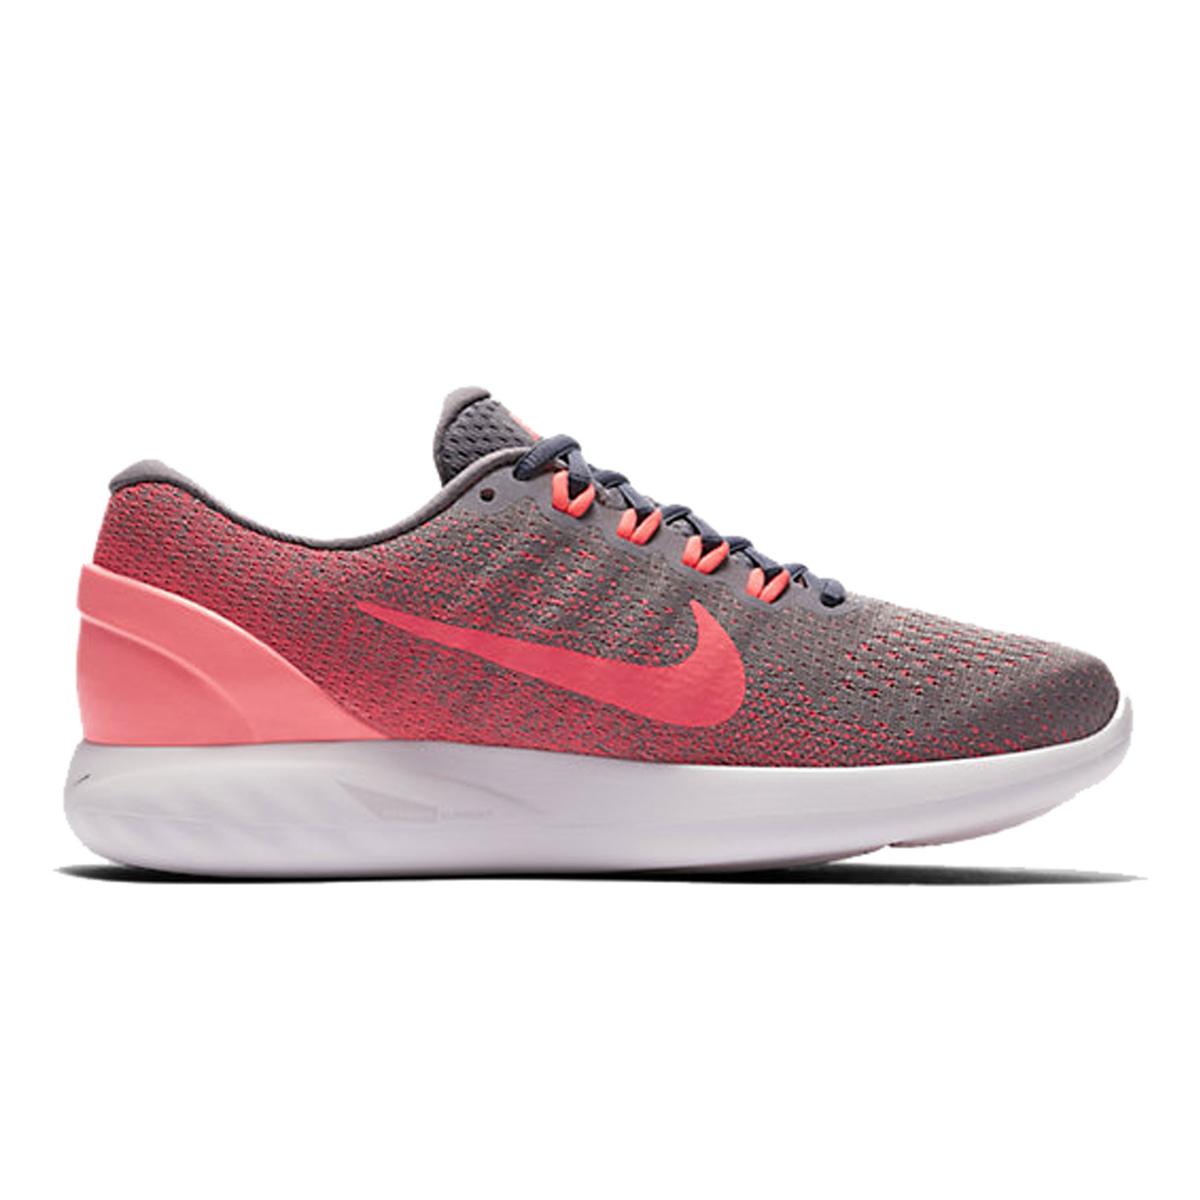 new concept 3fea7 27507 nike-904716-lunarglide 9 donna-scarpe-running-donna-035884501 006 1.jpg